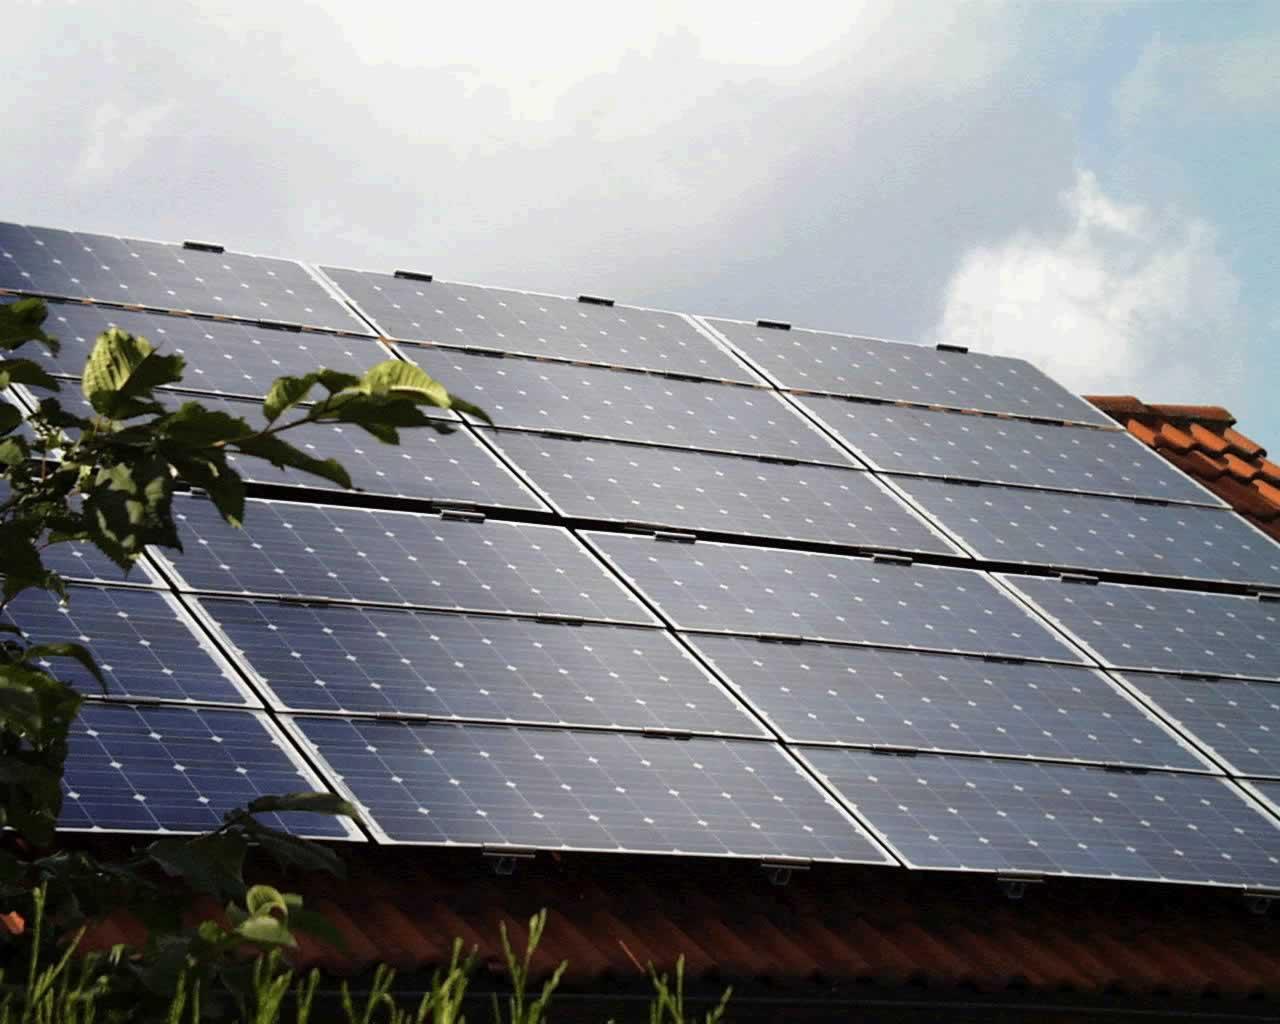 http://www.retepiacenza.it/UserFiles/Image/cornaca/pannelli_solari_fotovoltaici.jpg